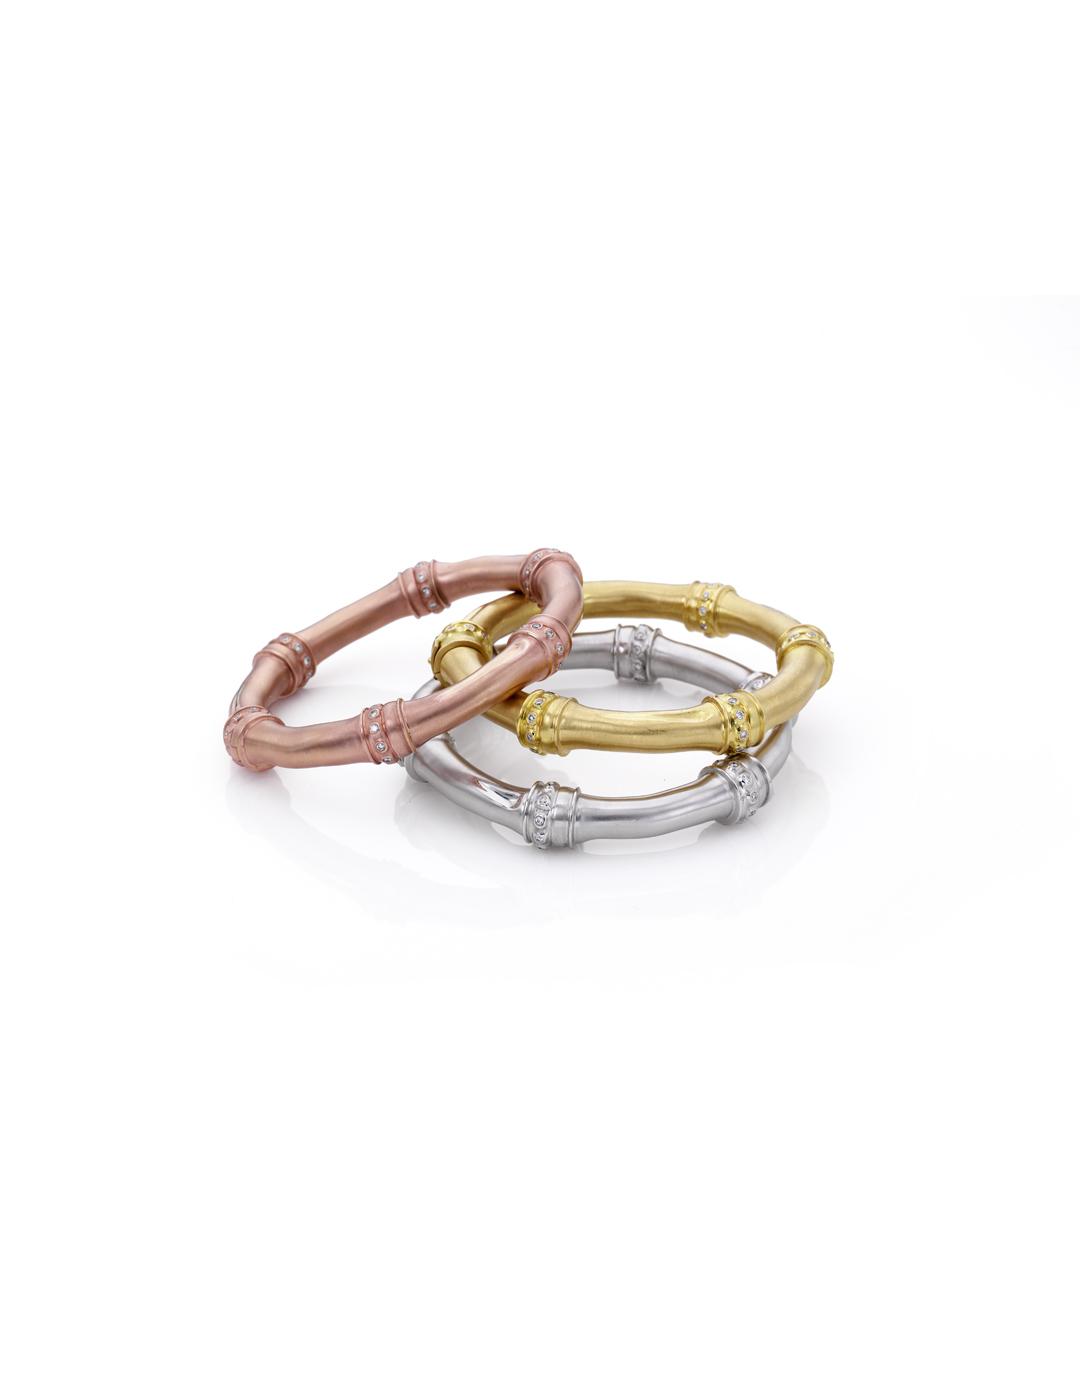 mish_jewelry_product_Jungle-Bamboo-RG-Bangle-2